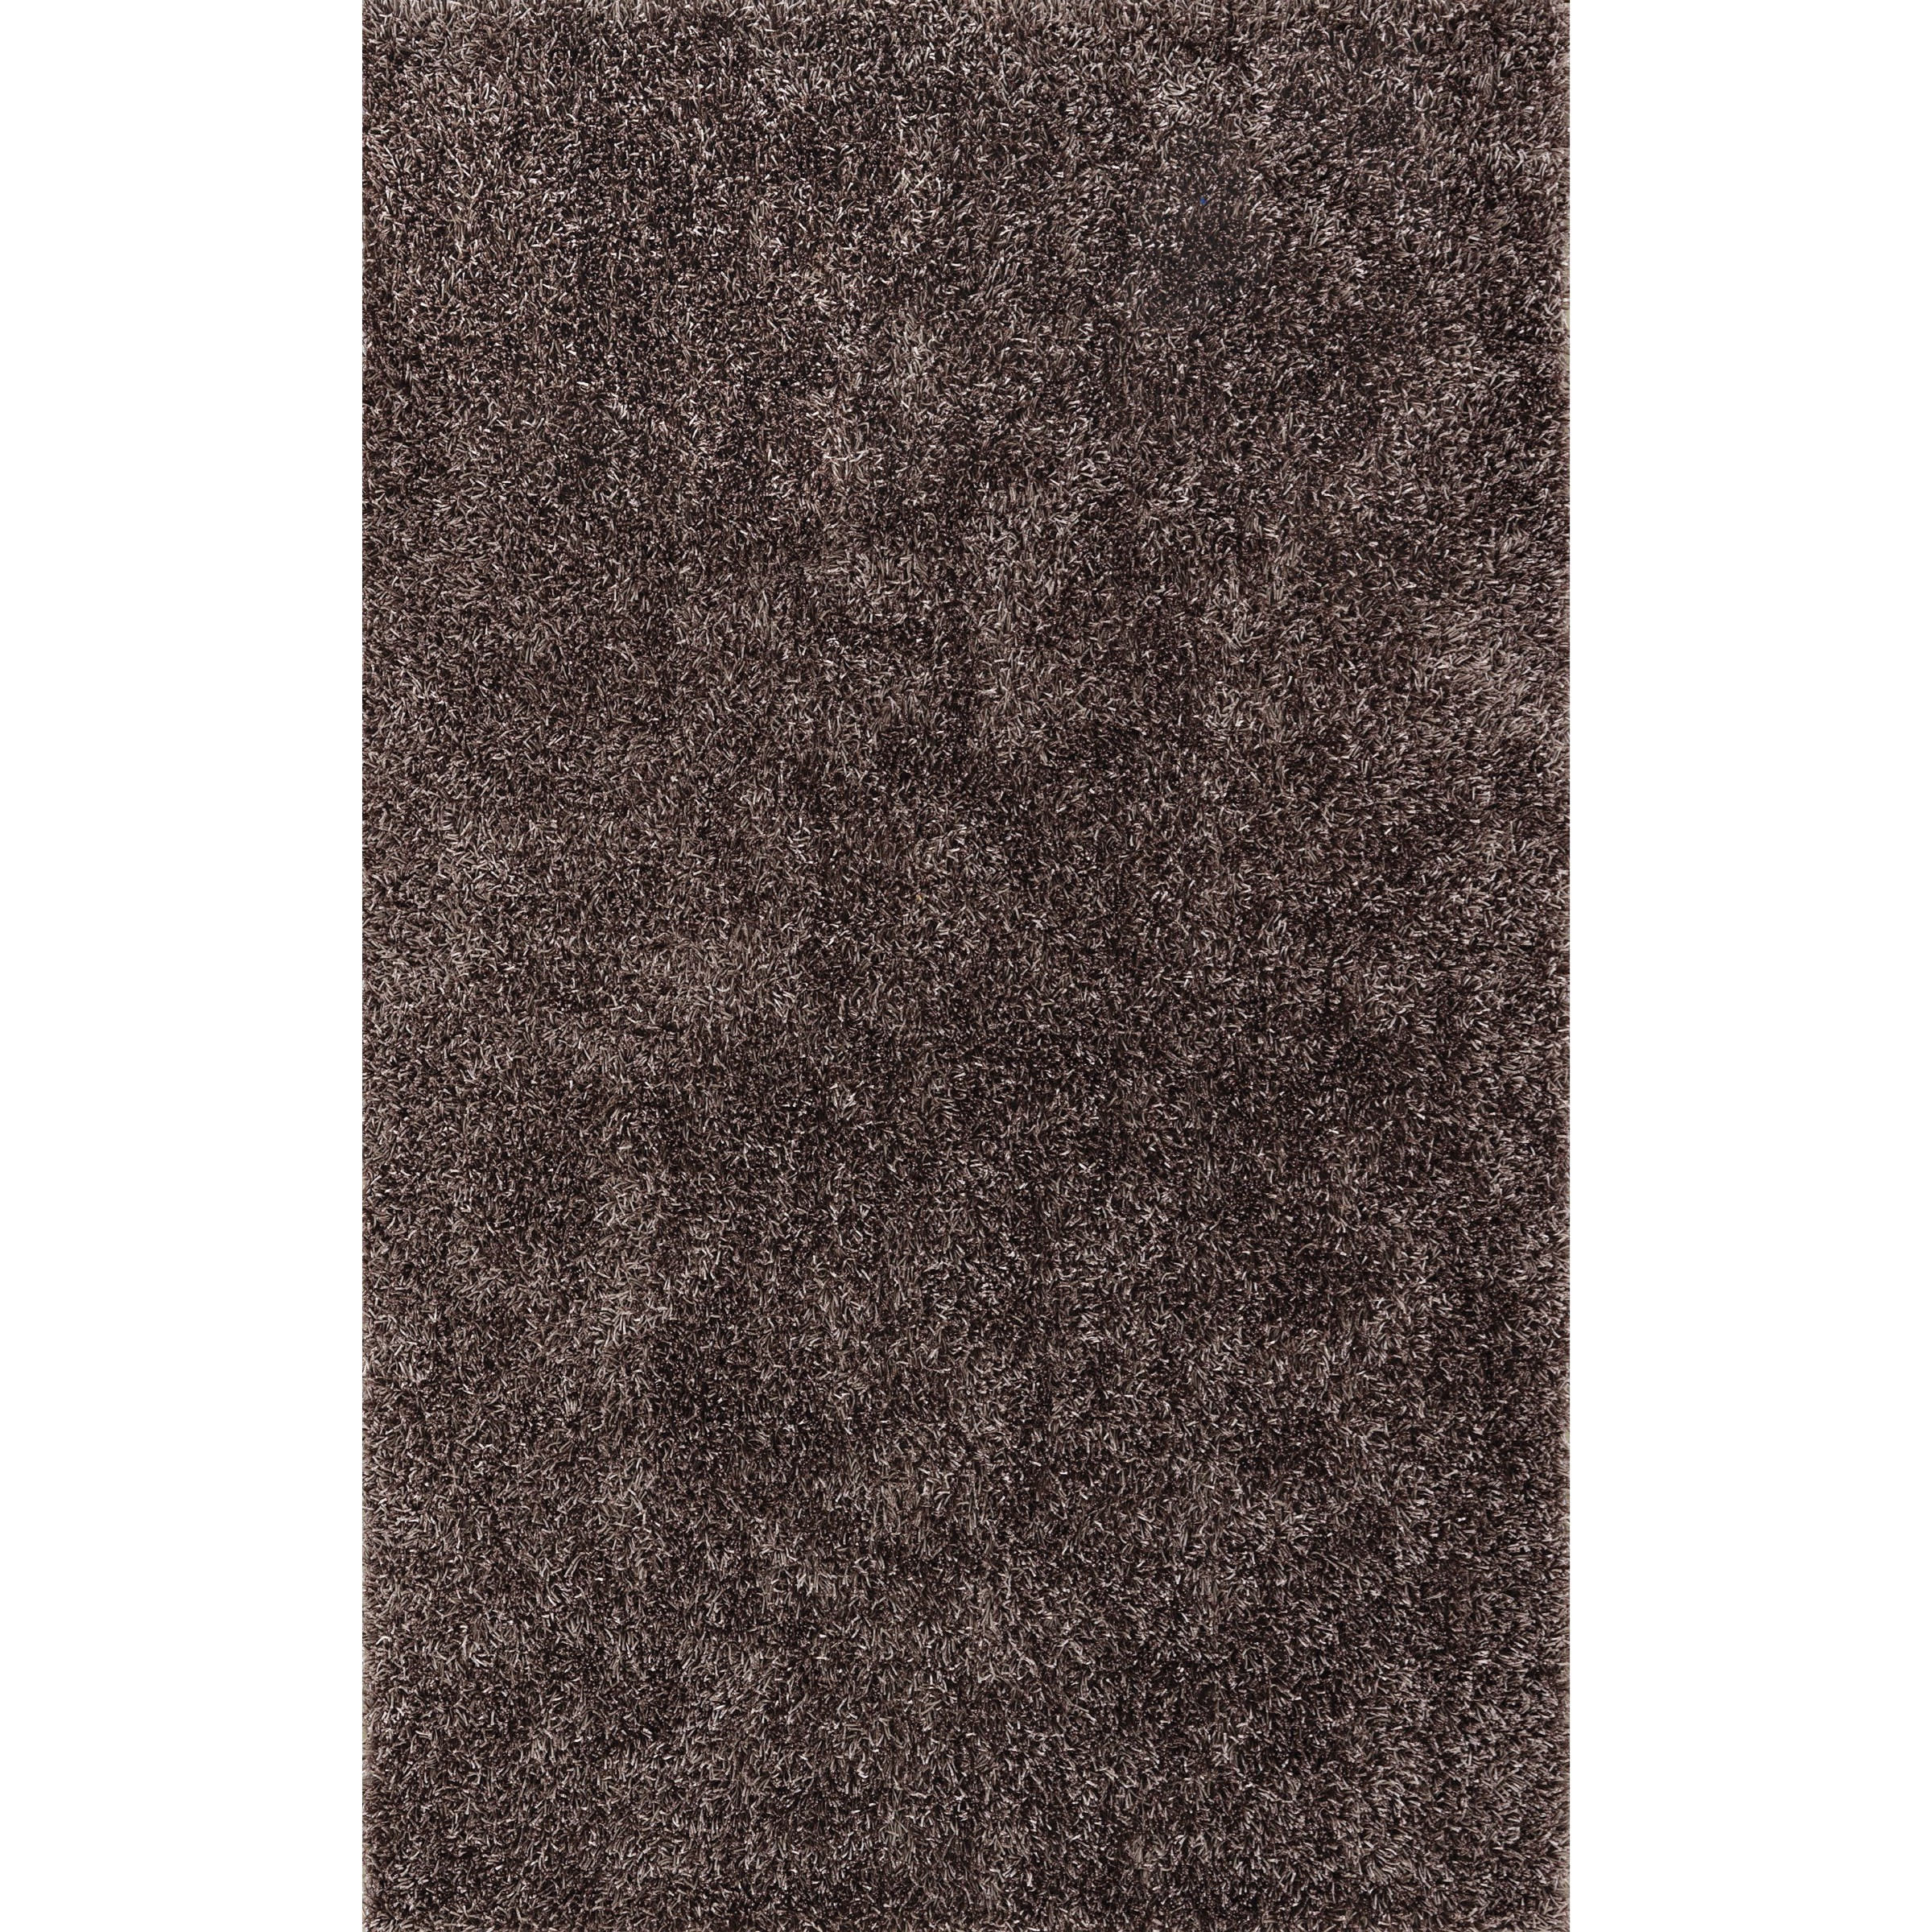 "Illusions Grey 5'X7'6"" Rug by Dalyn at Sadler's Home Furnishings"